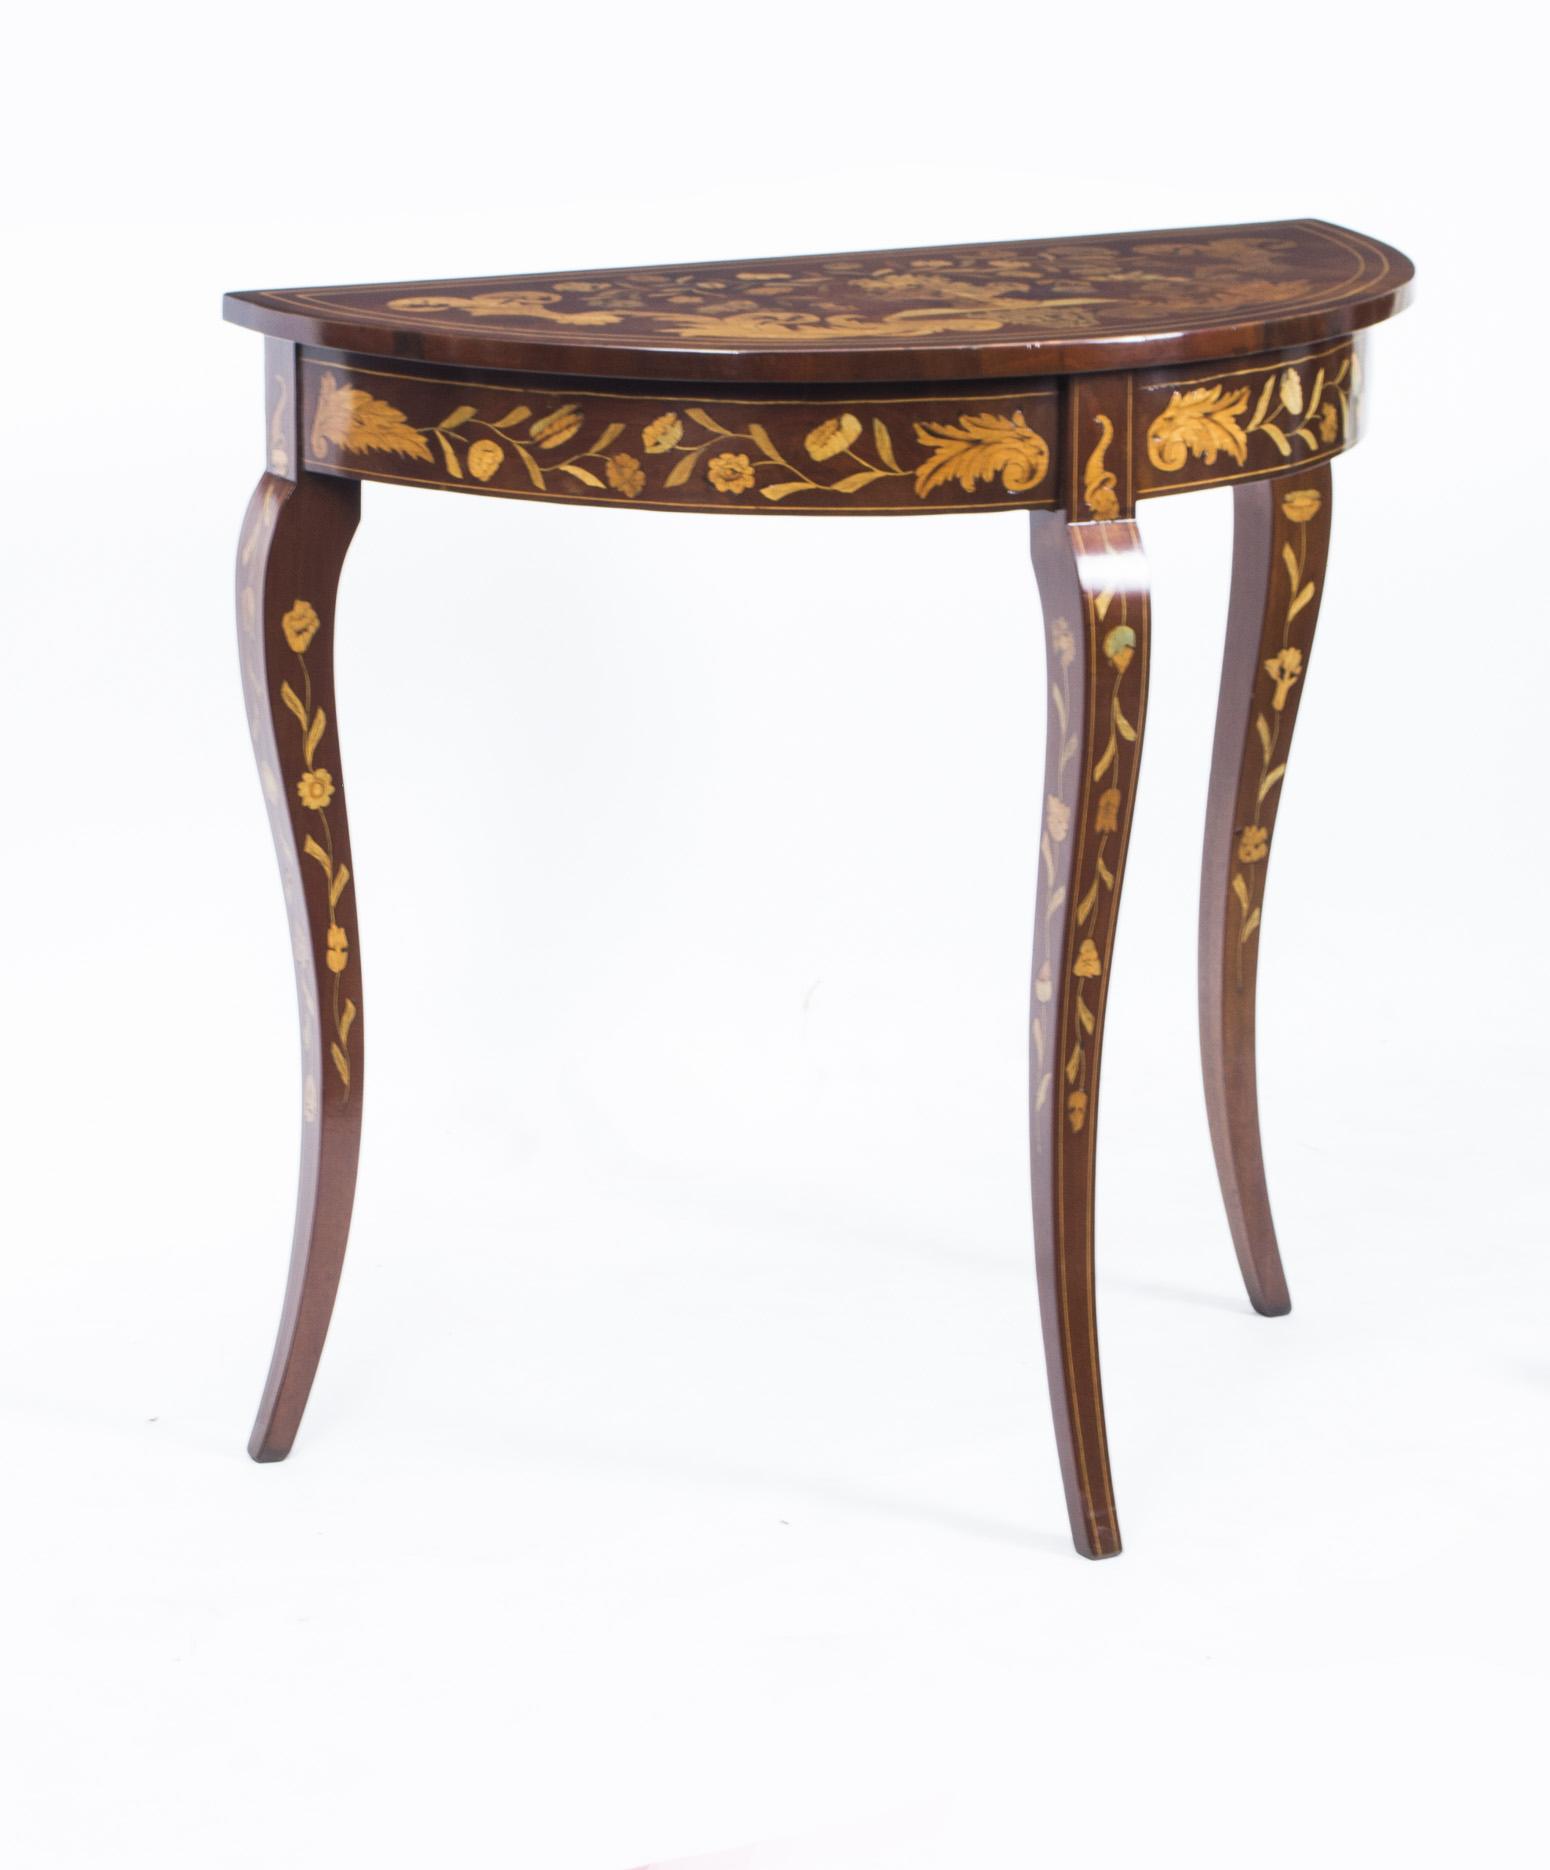 regent antiques console tables antique dutch marquetry console table c1780. Black Bedroom Furniture Sets. Home Design Ideas